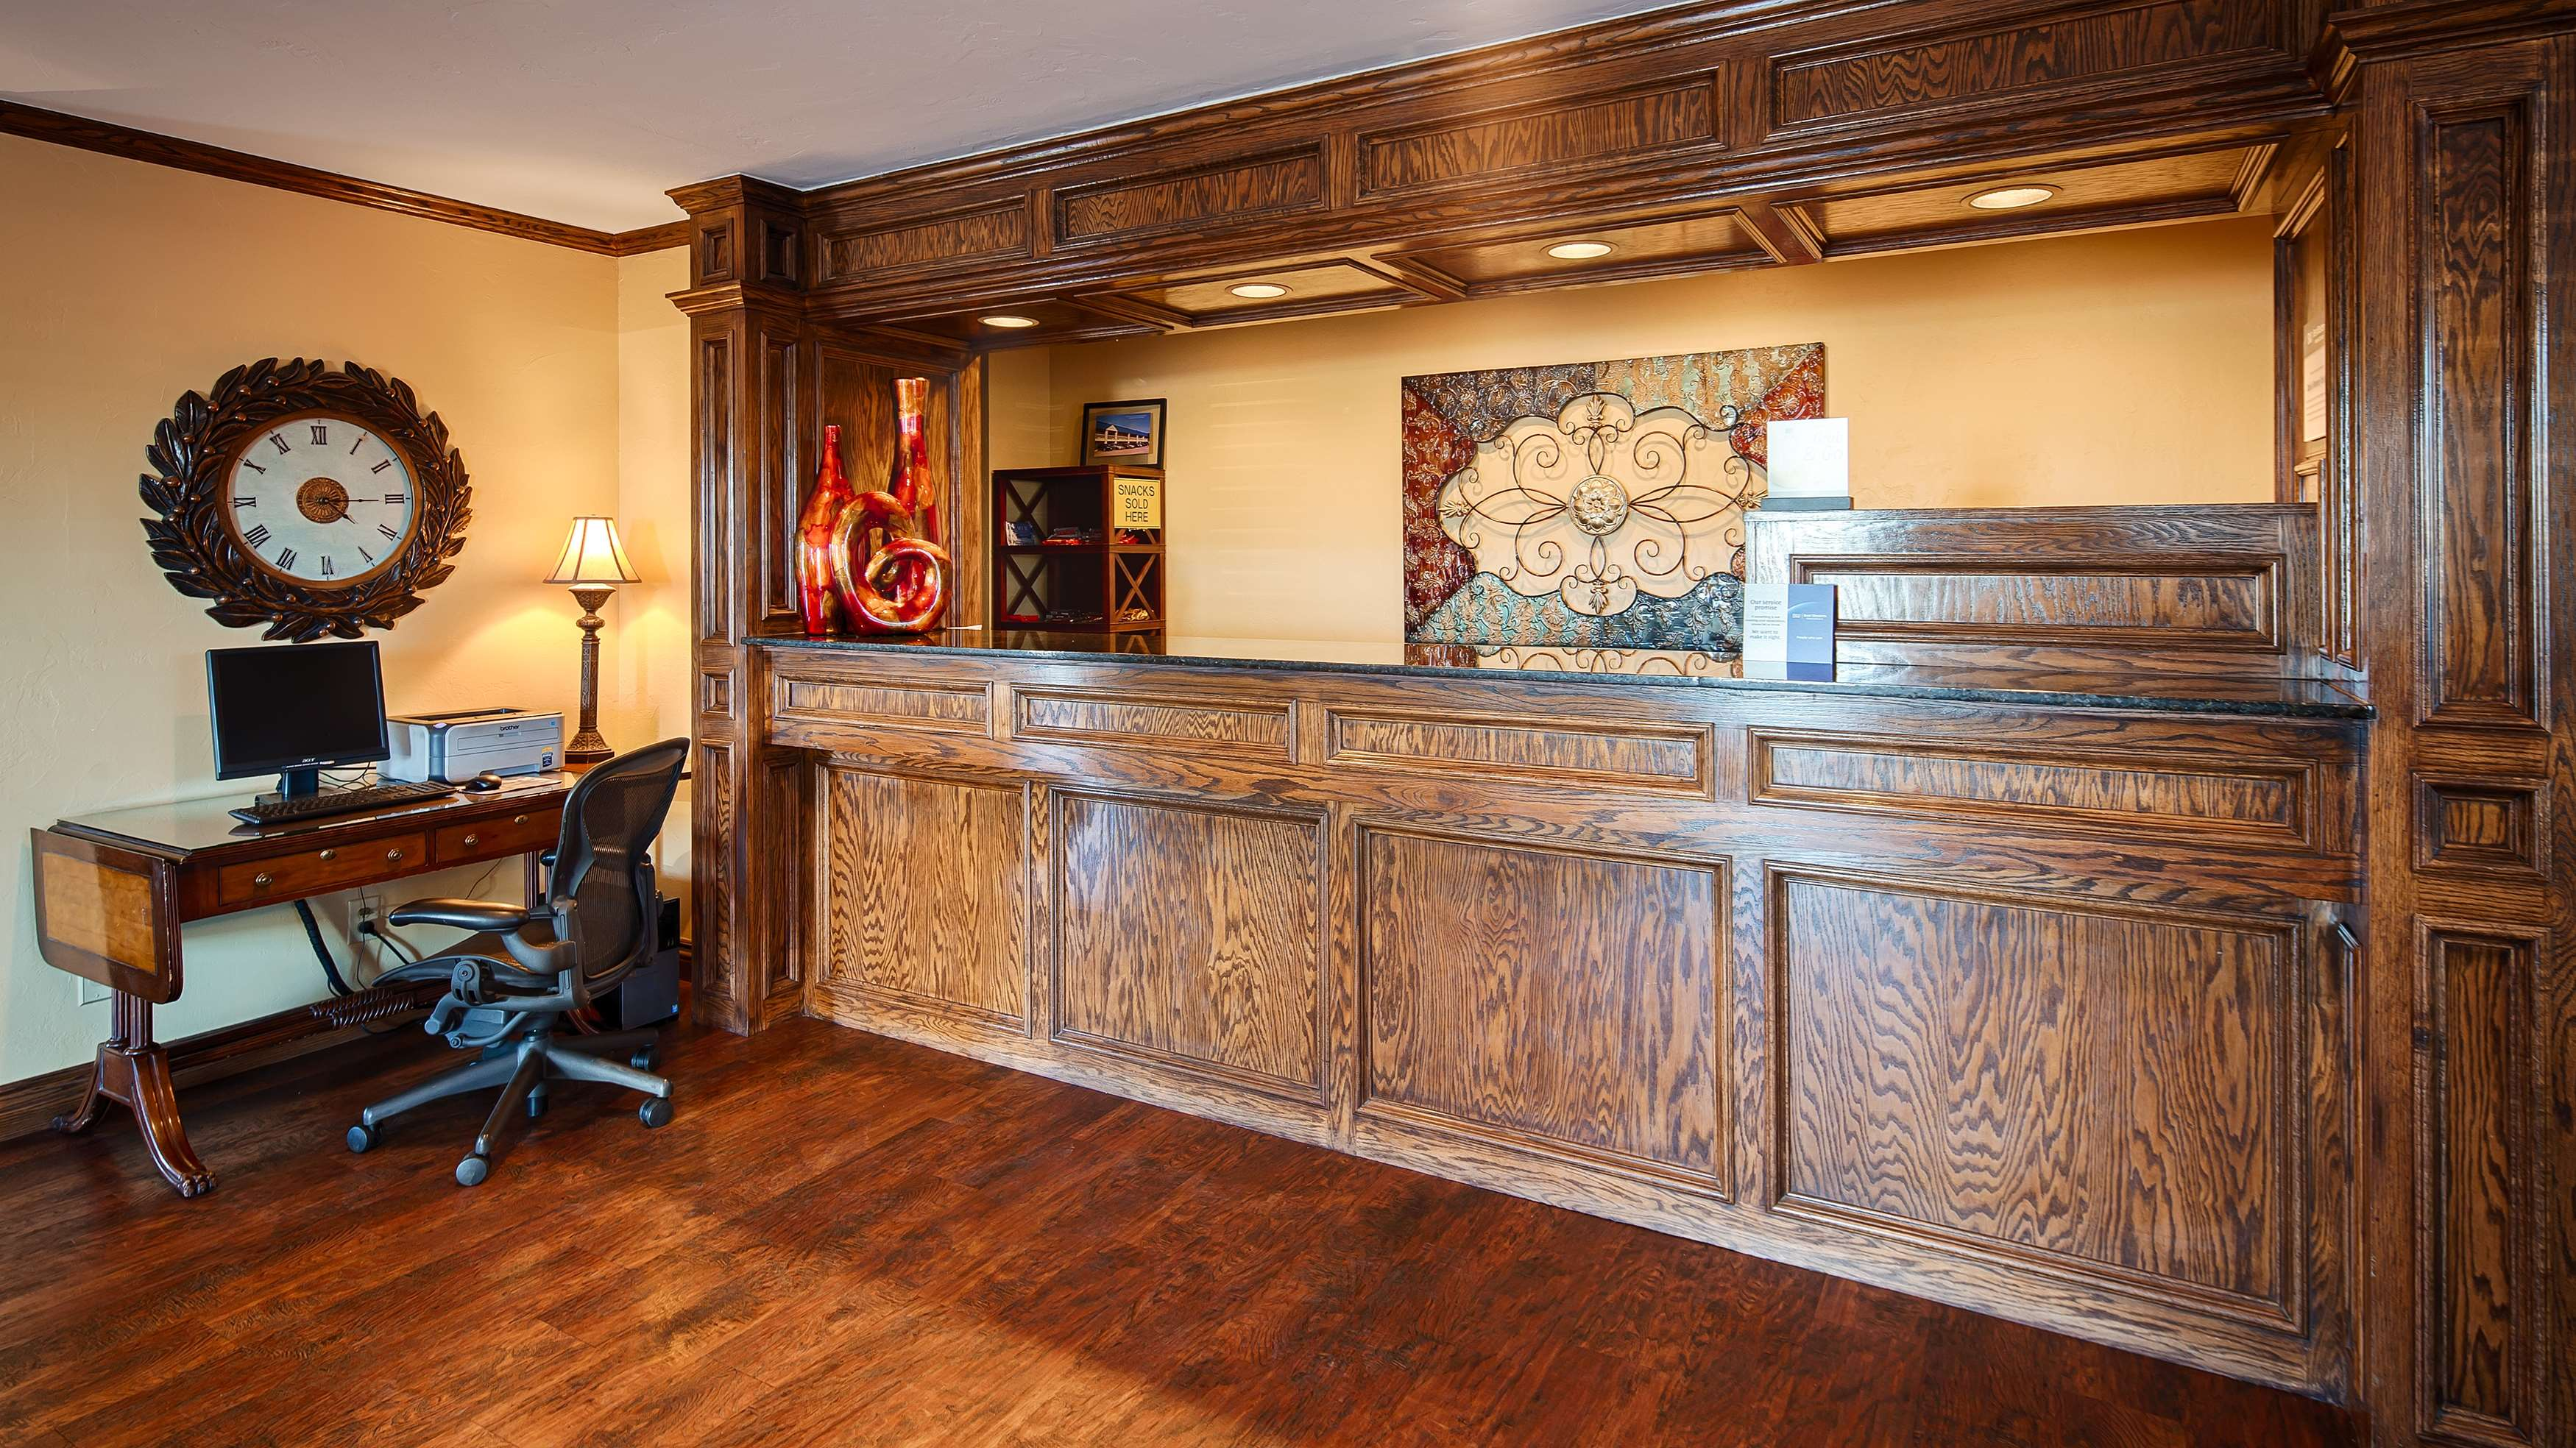 Best Western Inn of McAlester image 6